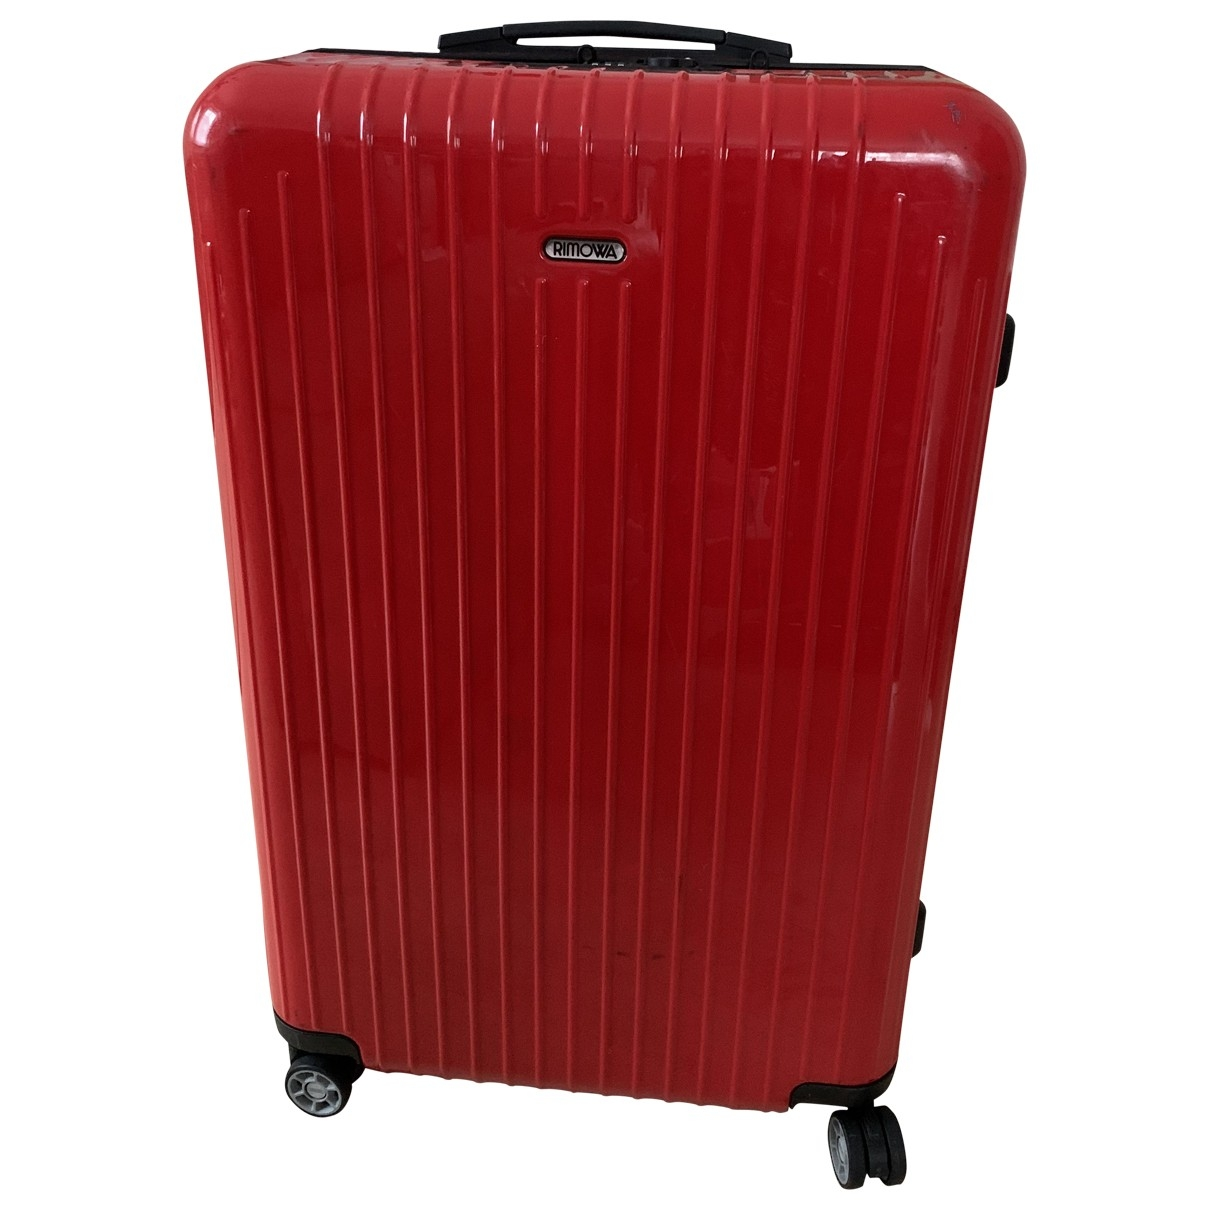 Viajes Check-in size Rimowa